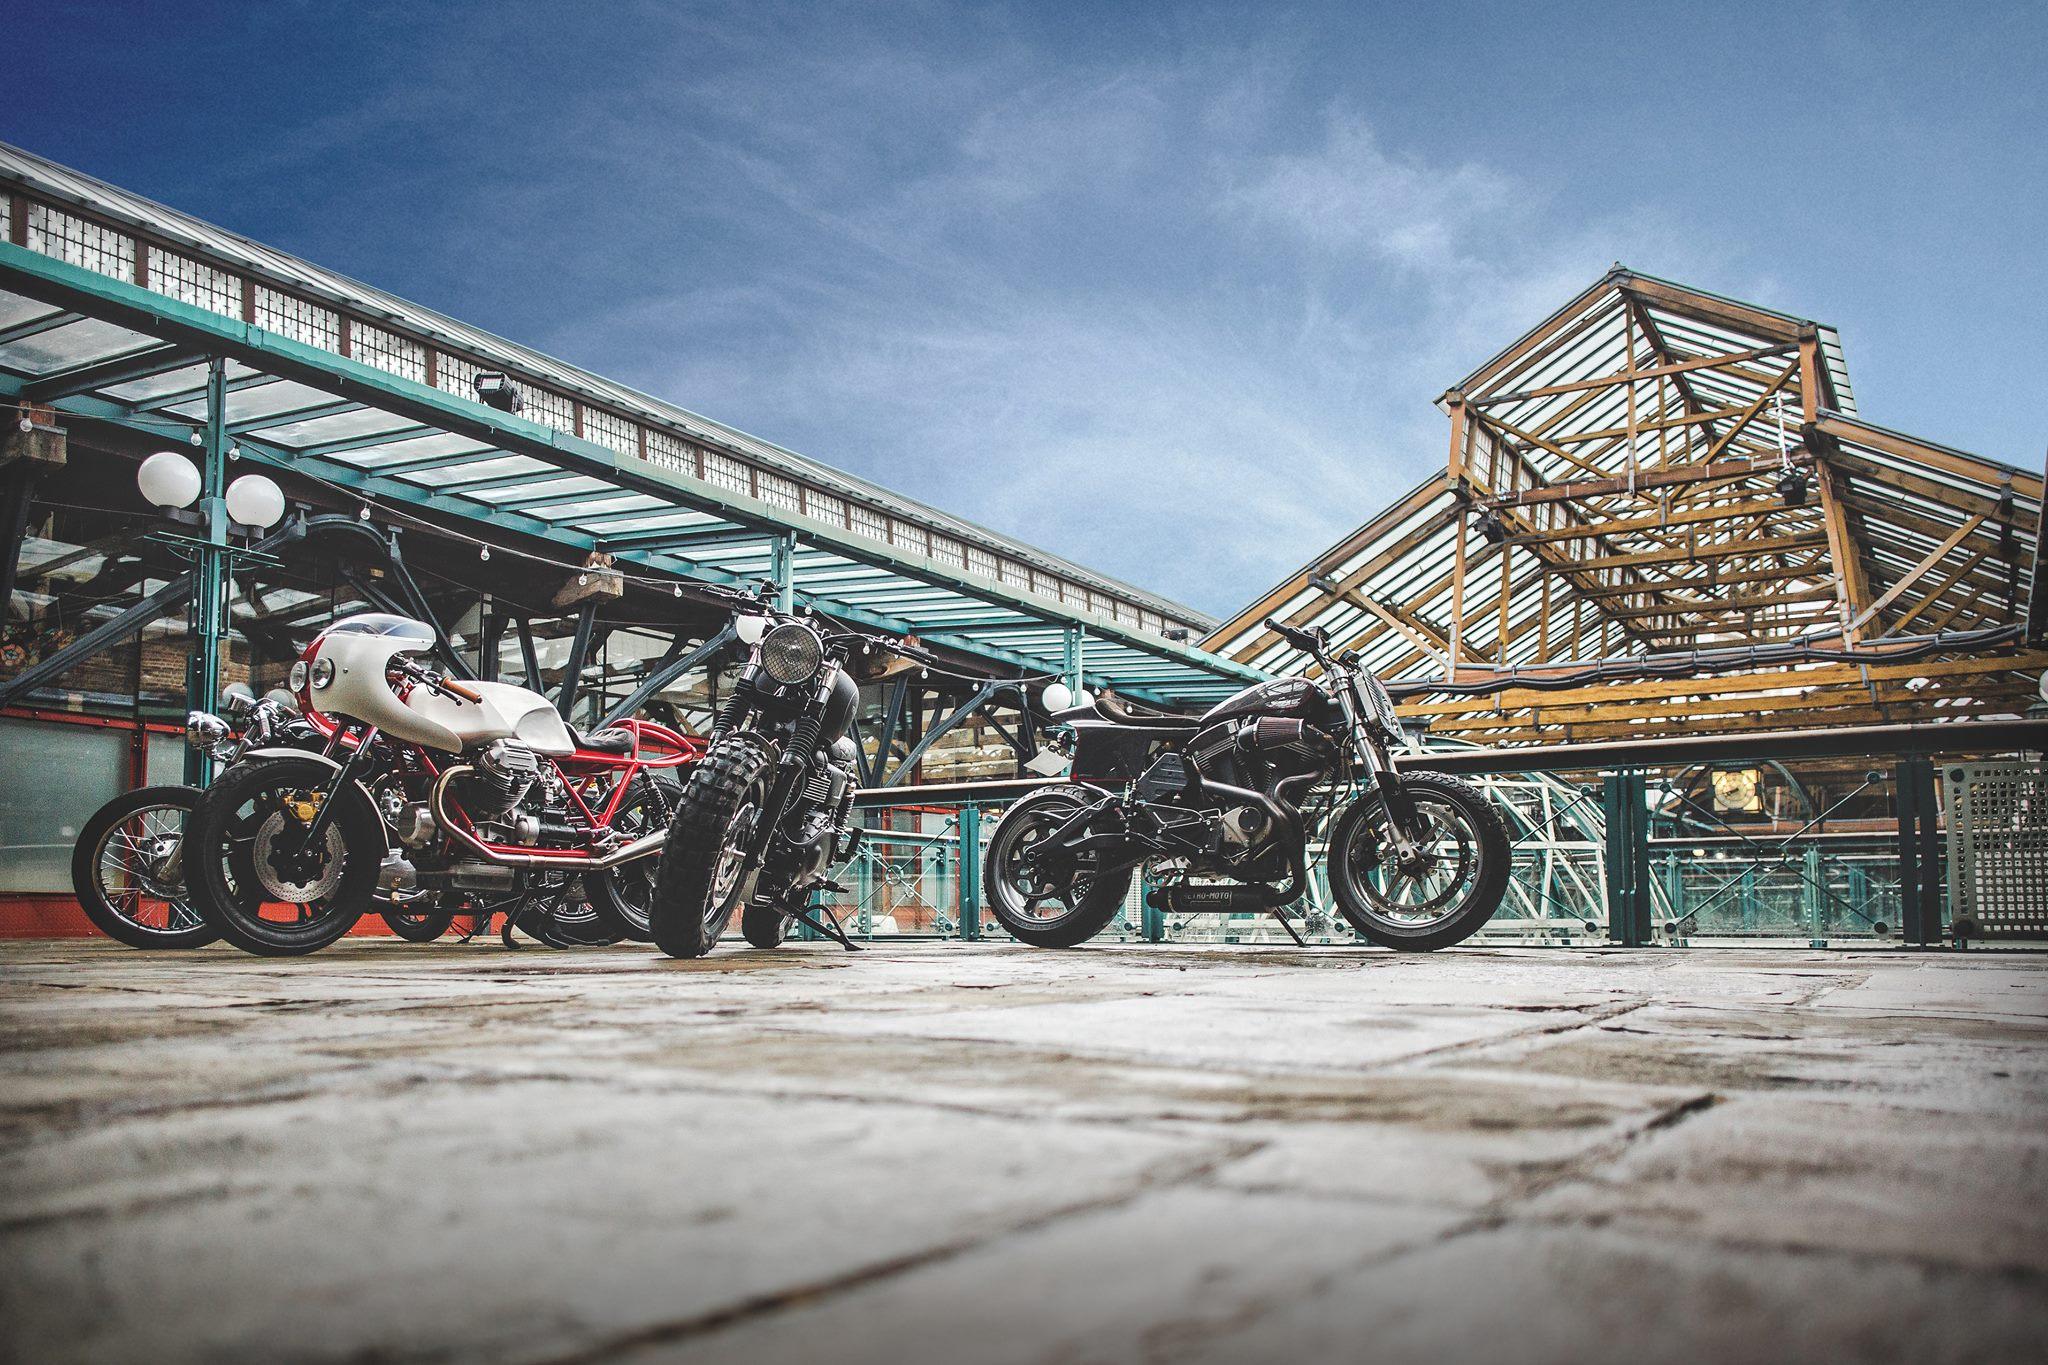 Bike Shed dock